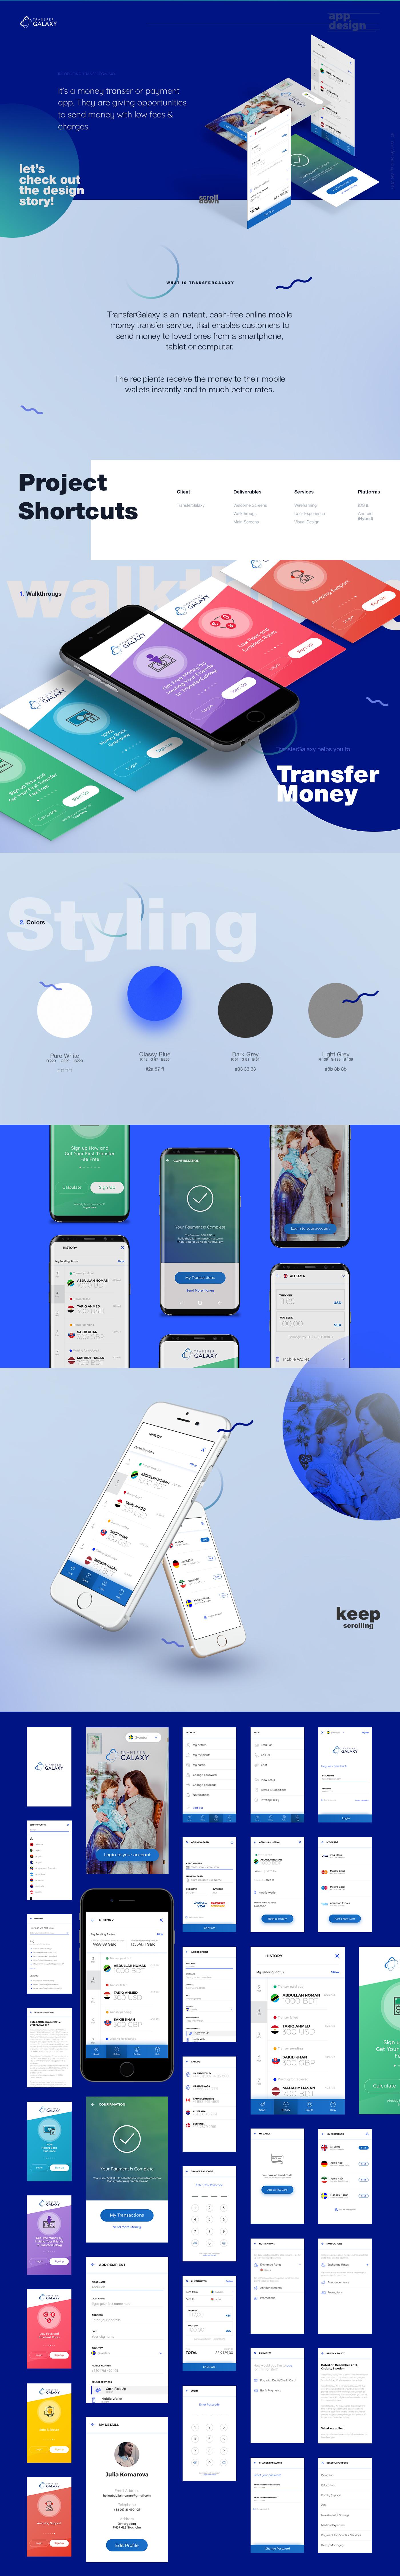 TransferGalaxy Money Transfer App | App Design (Android) | Mobile